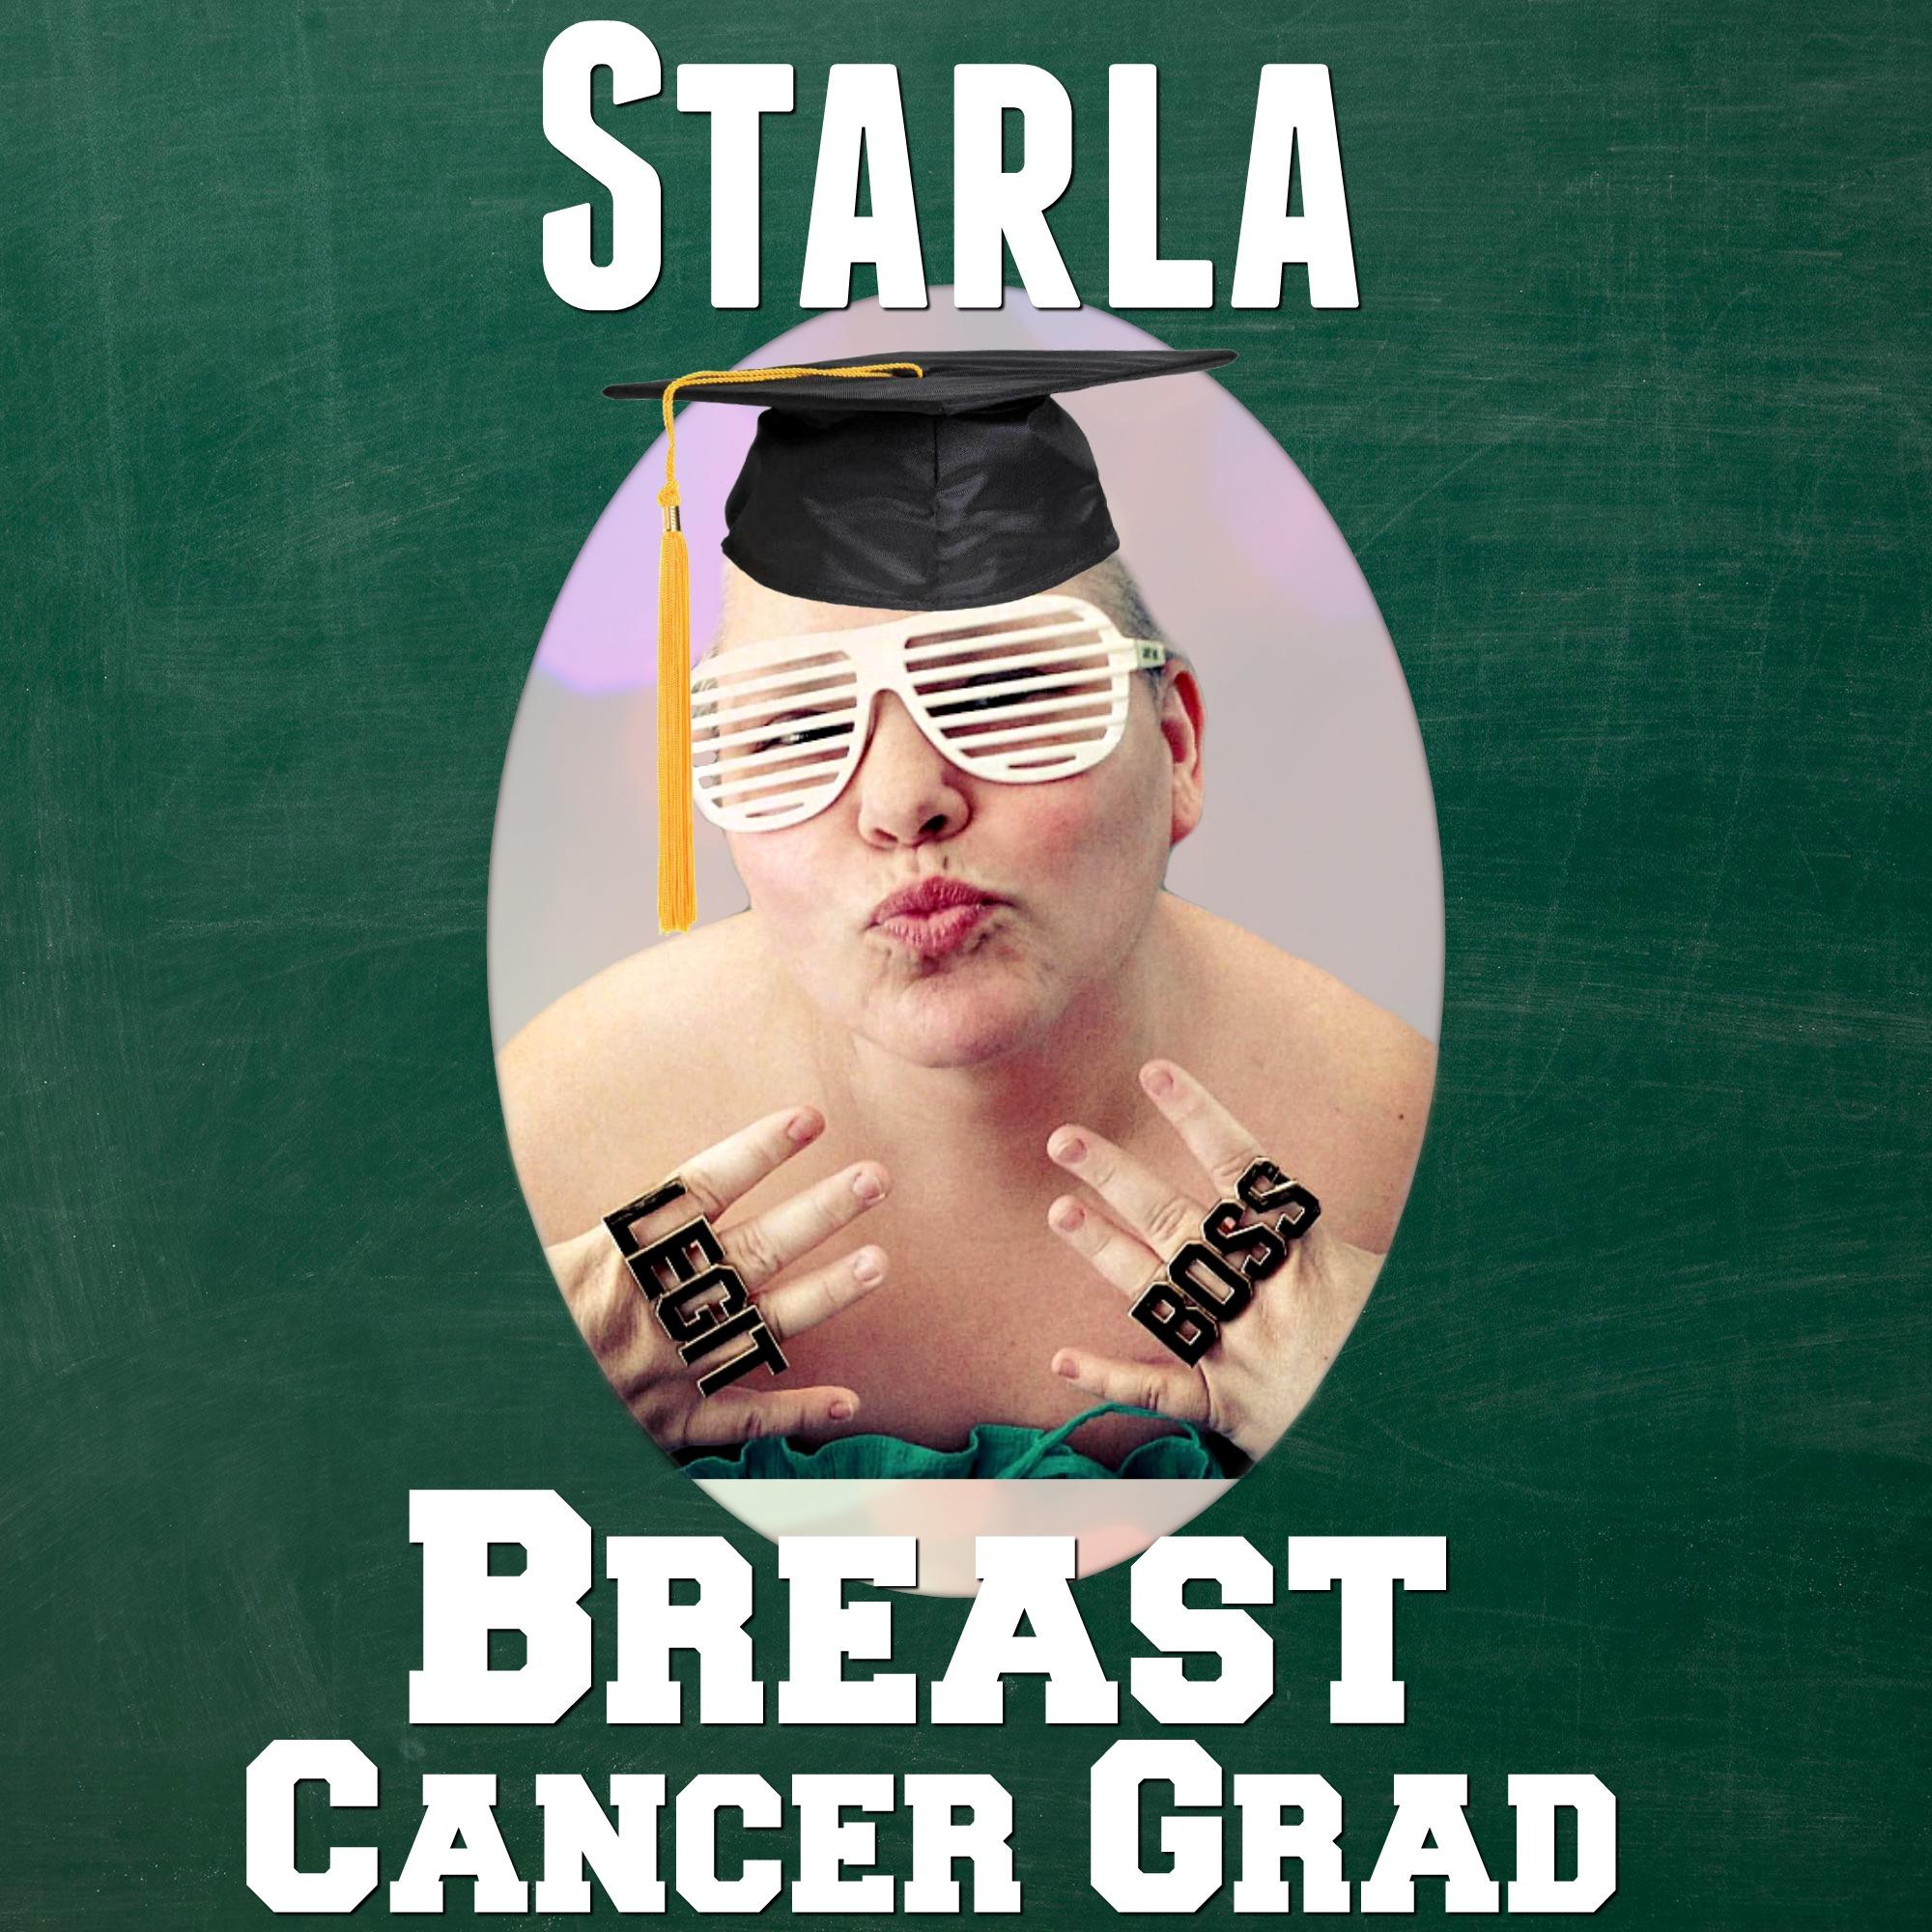 Starla_Smith_CancerGrad_Yearbook_Legit_Boss_Breast_Cancer